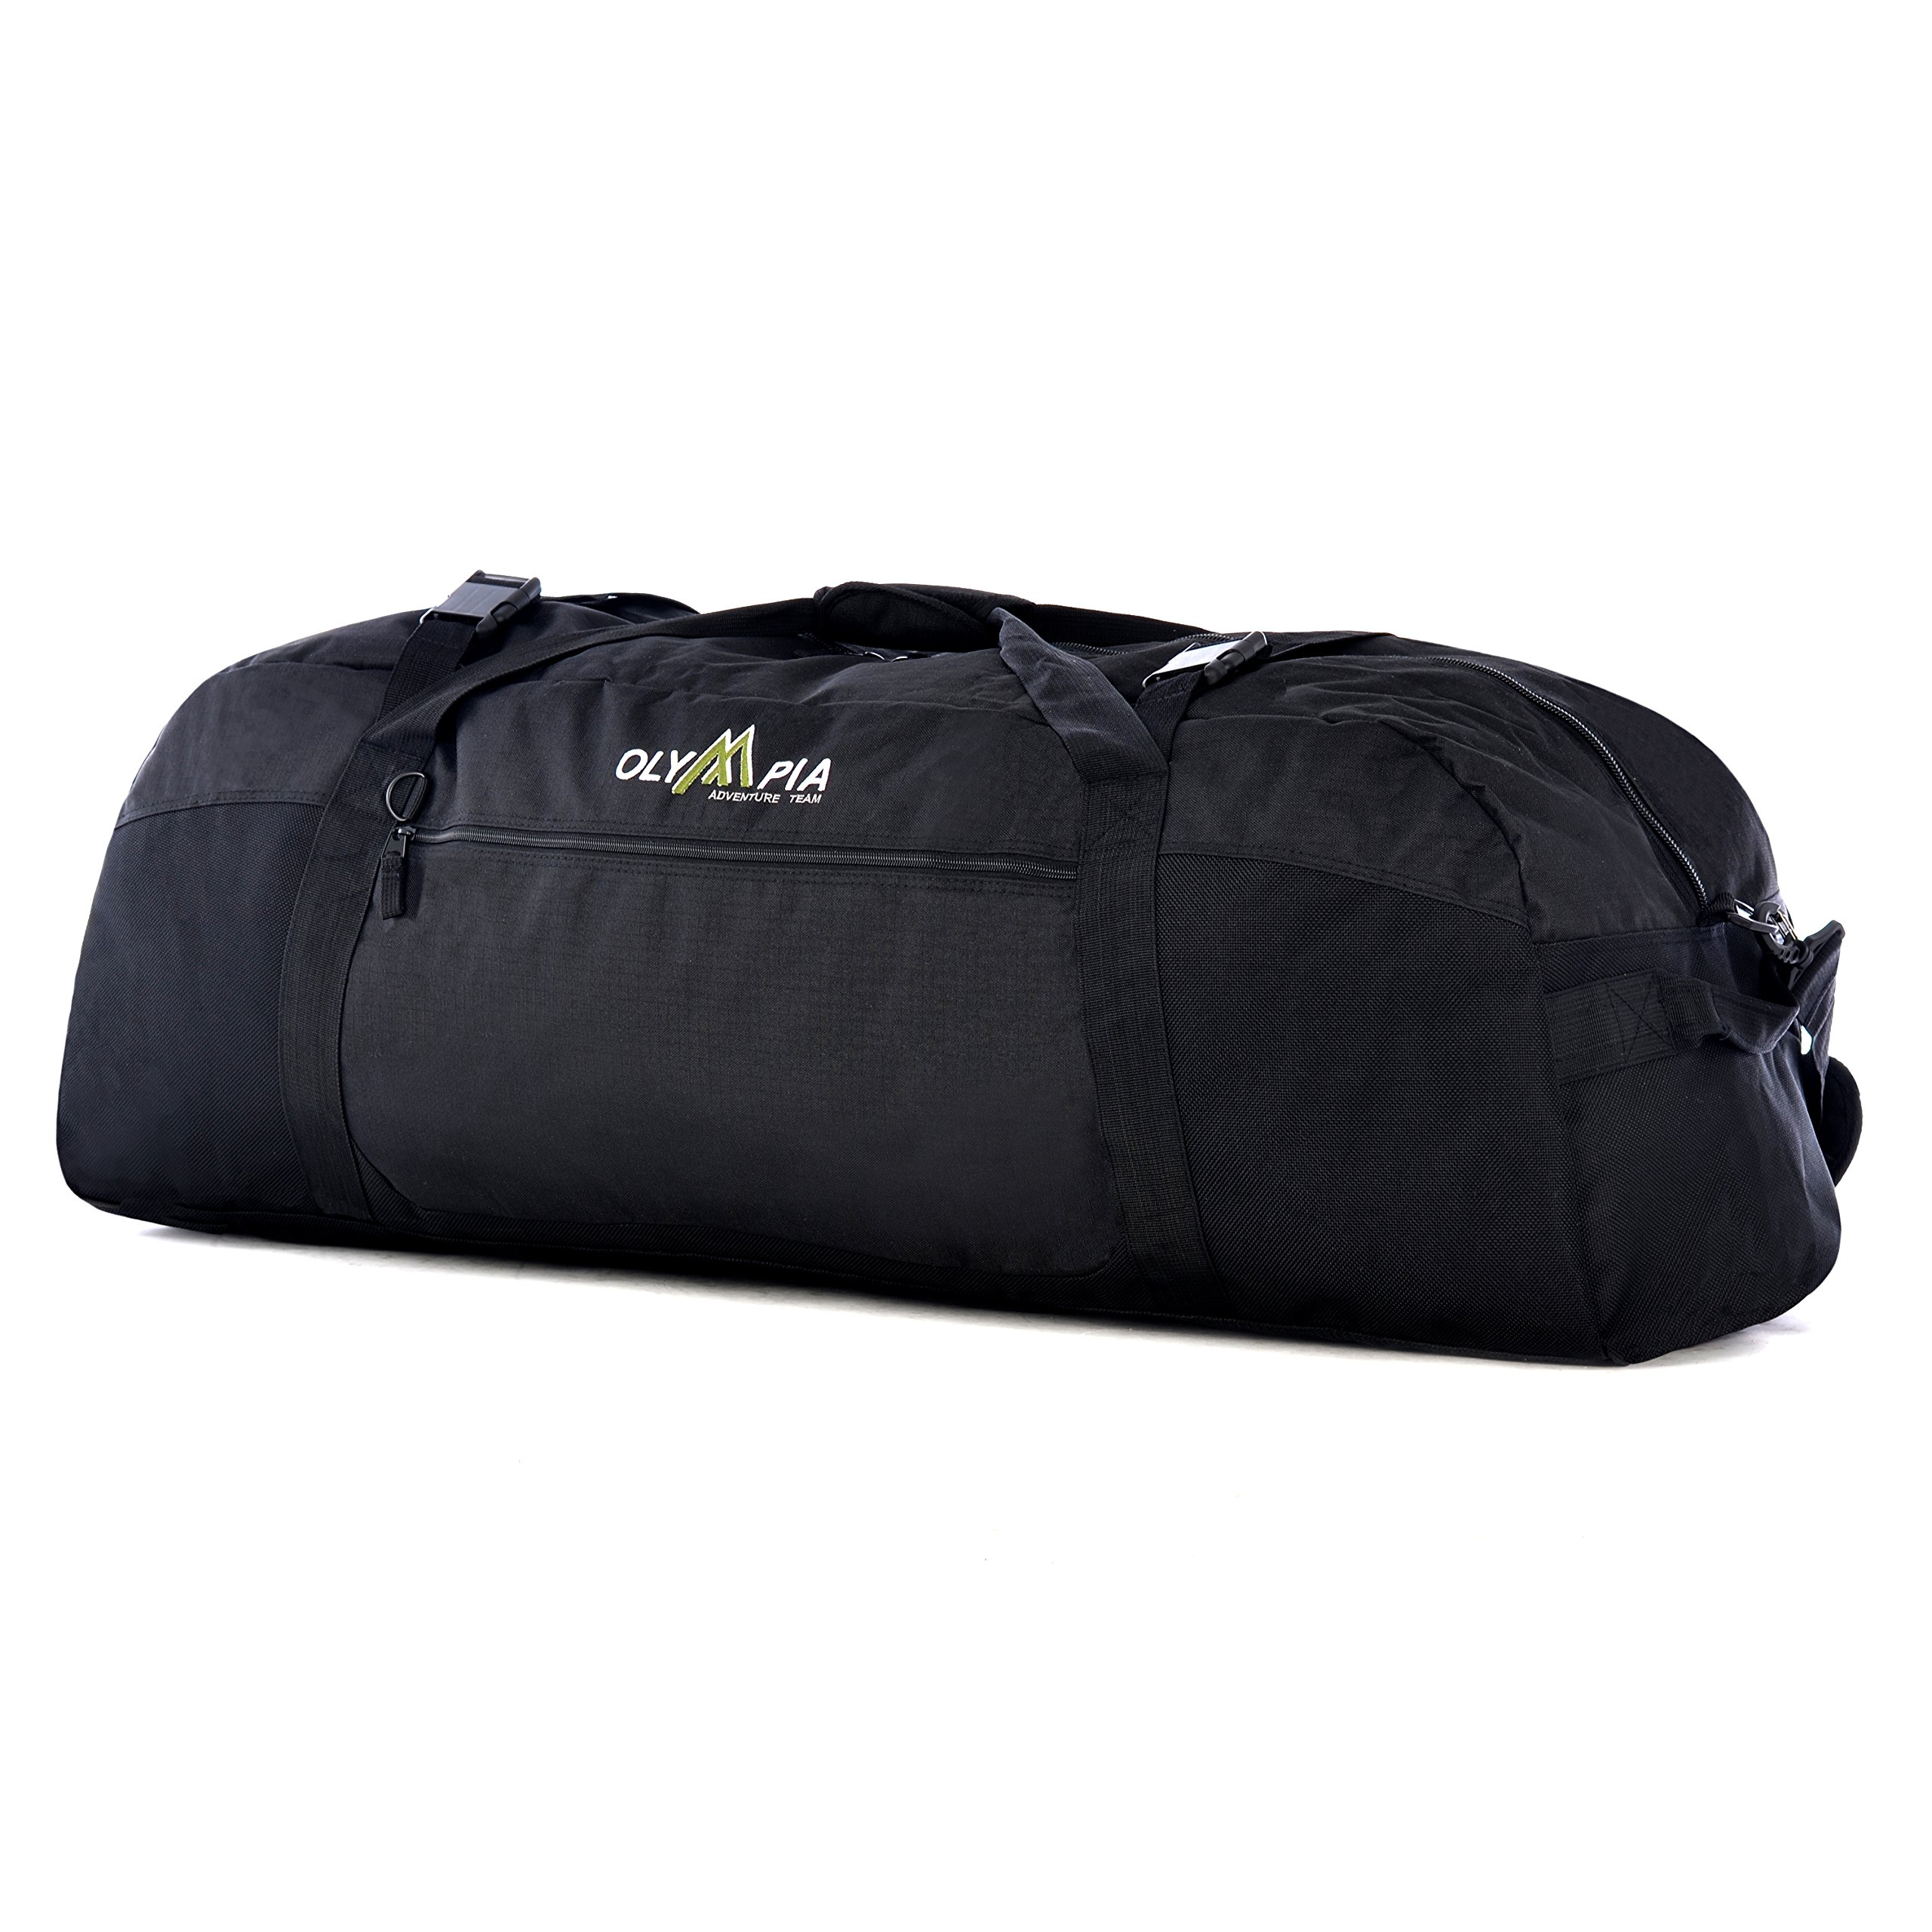 Olympia Luggage 36 Inch Sports Duffel,Black,One Size